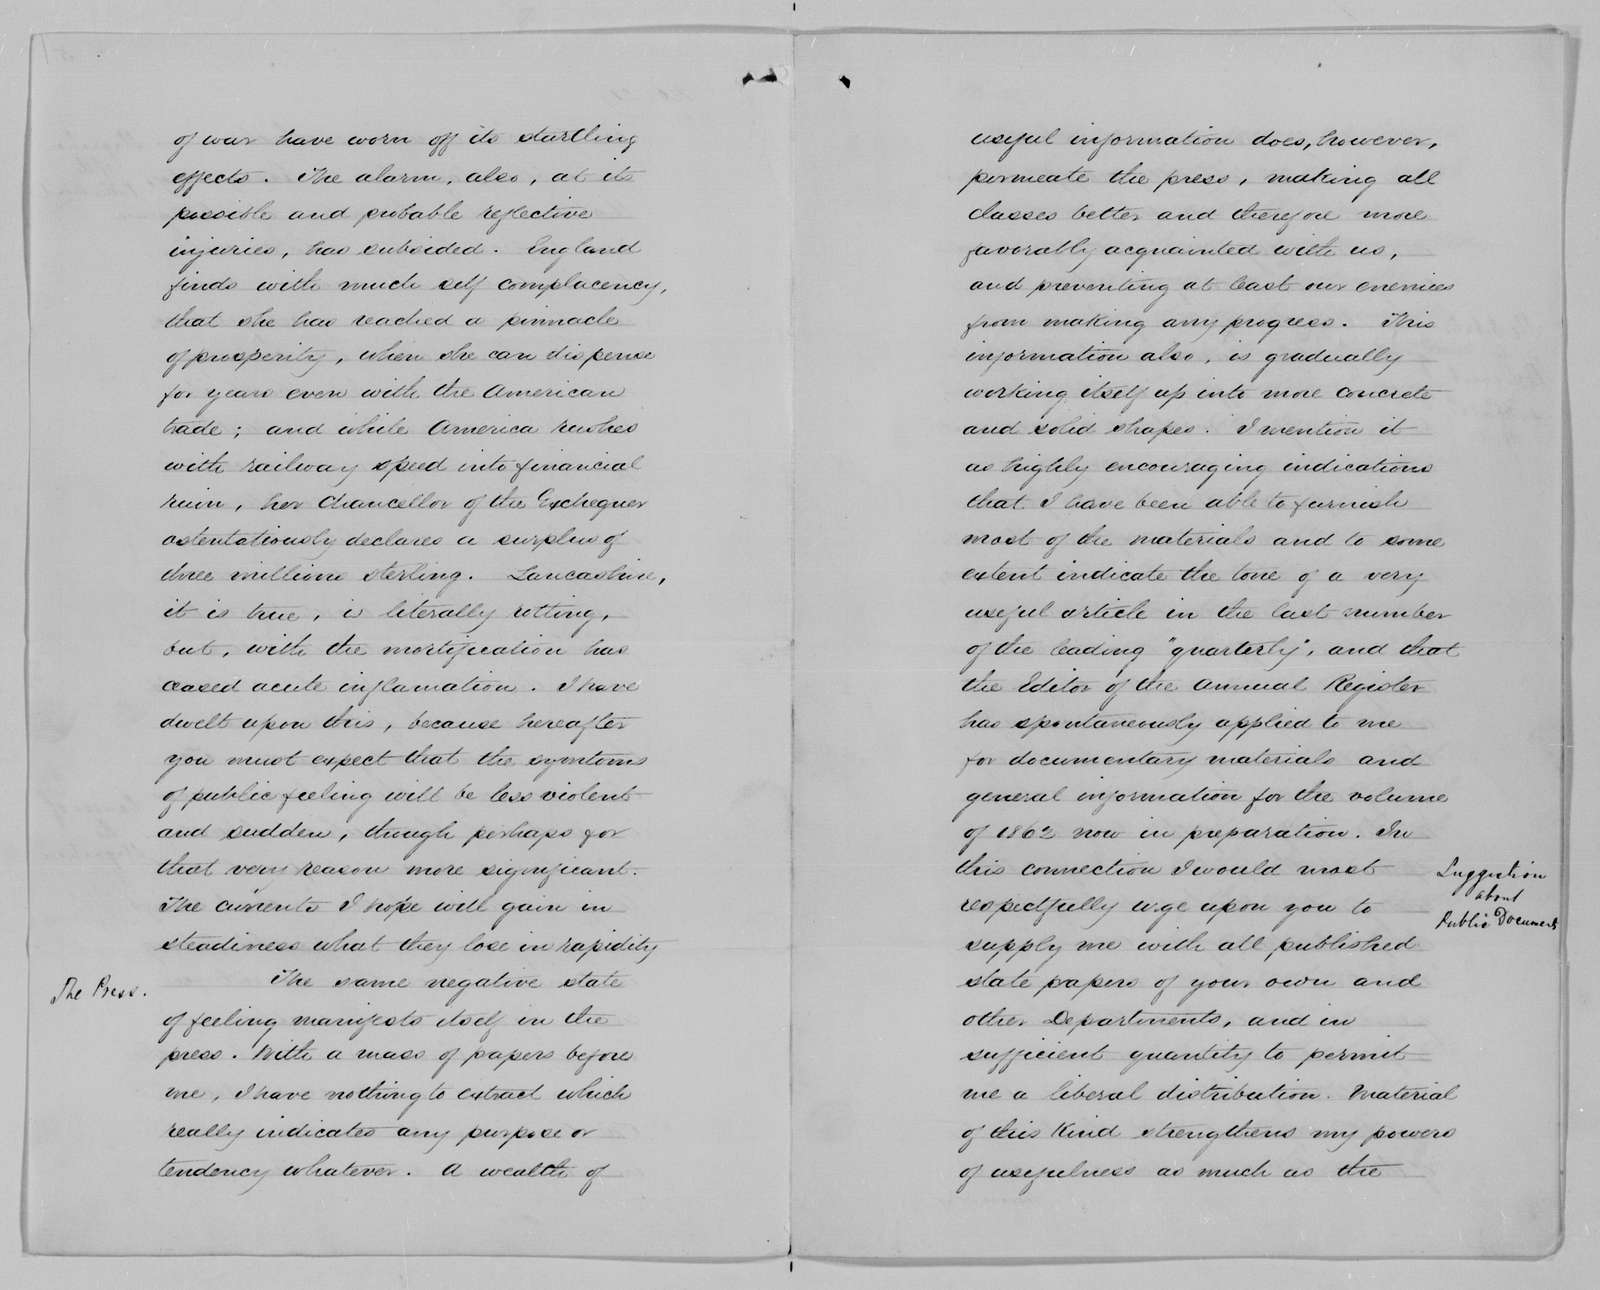 Confederate States of America records: Microfilm Reel 7